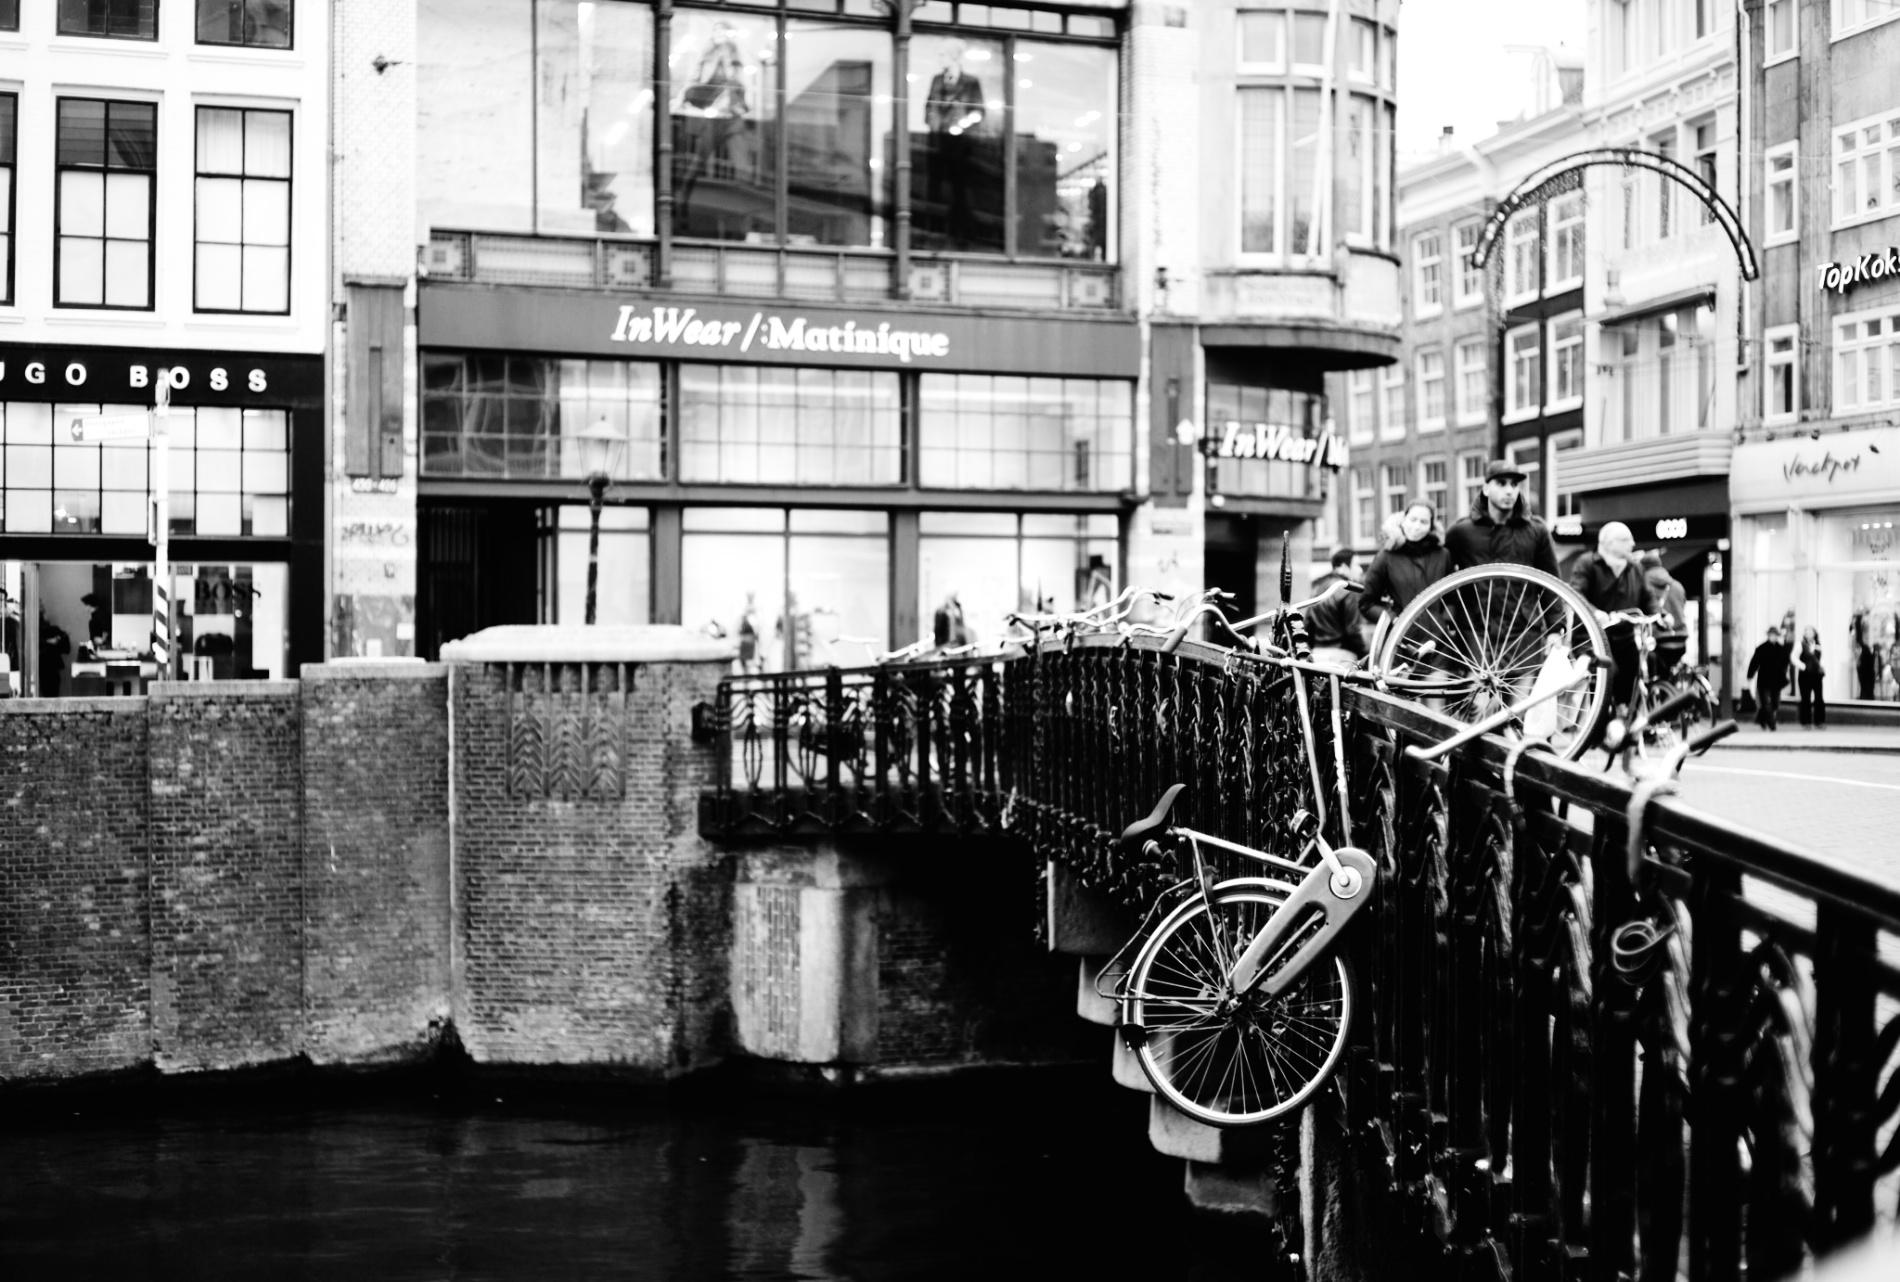 2011-11-07 at 22-53-55, street amsterdam.jpg